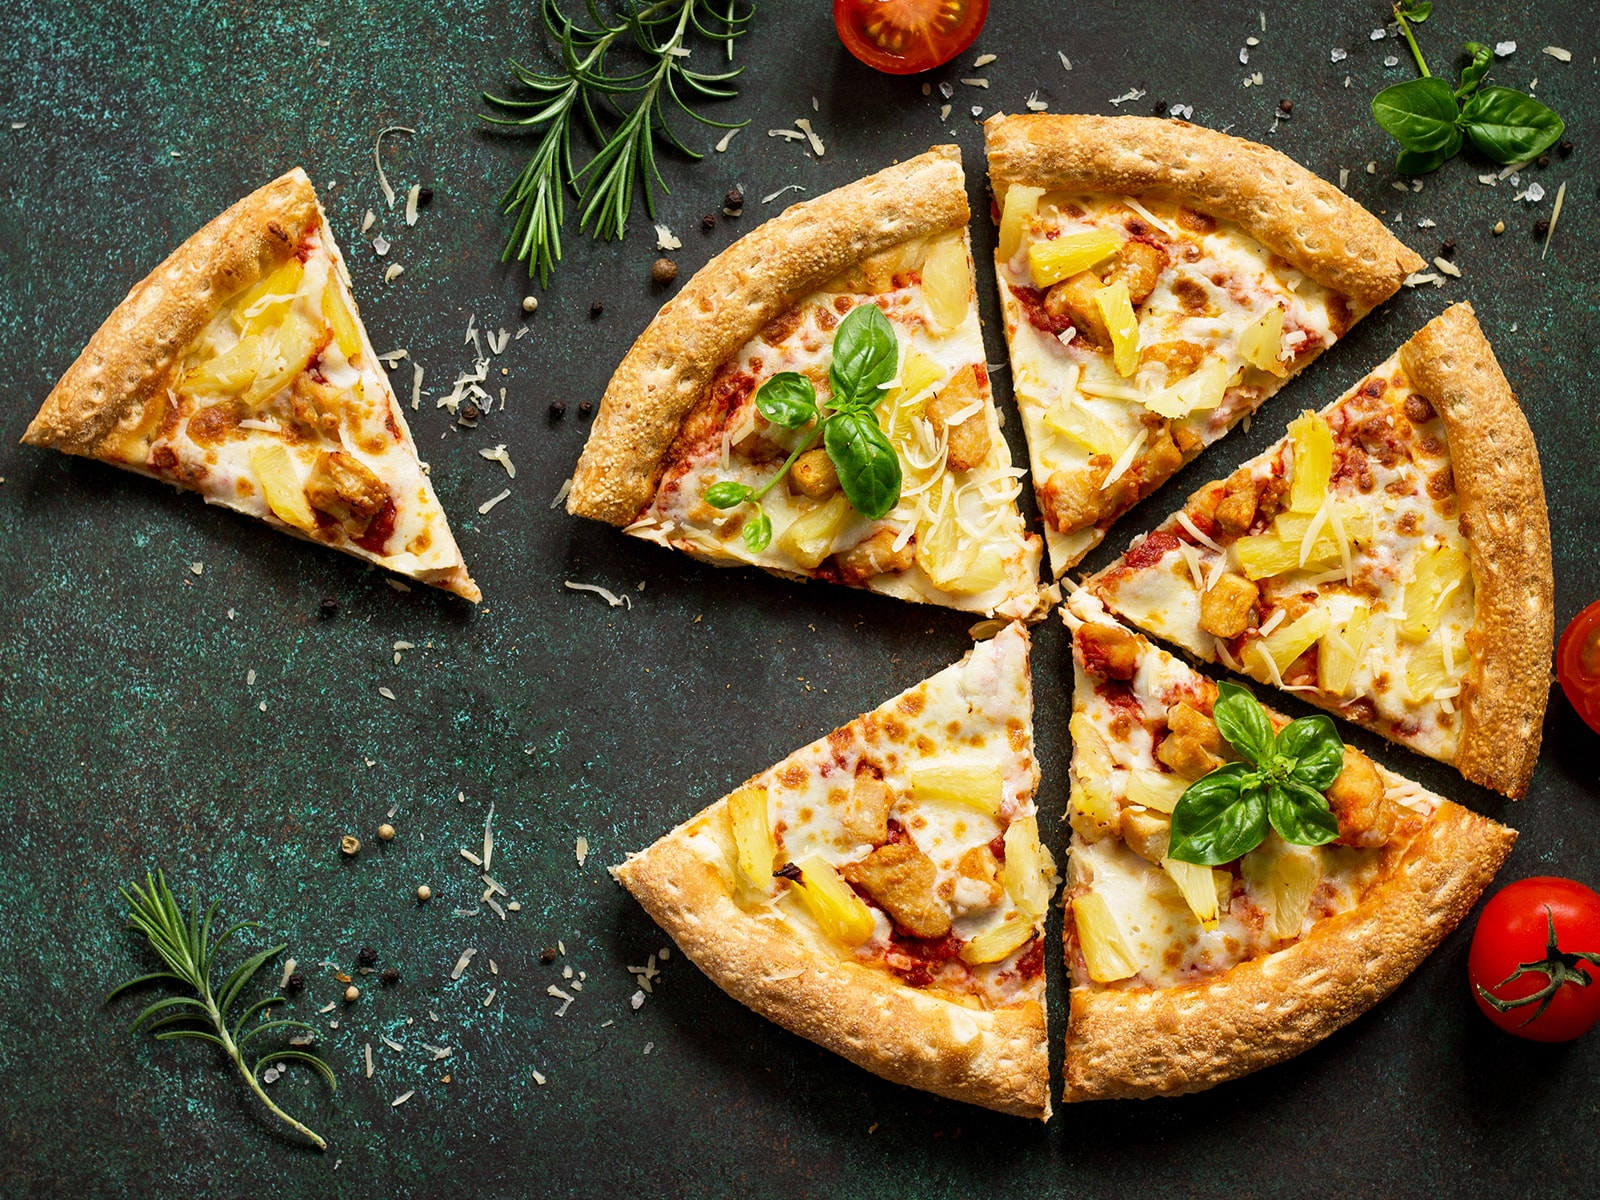 Bagi Pizza